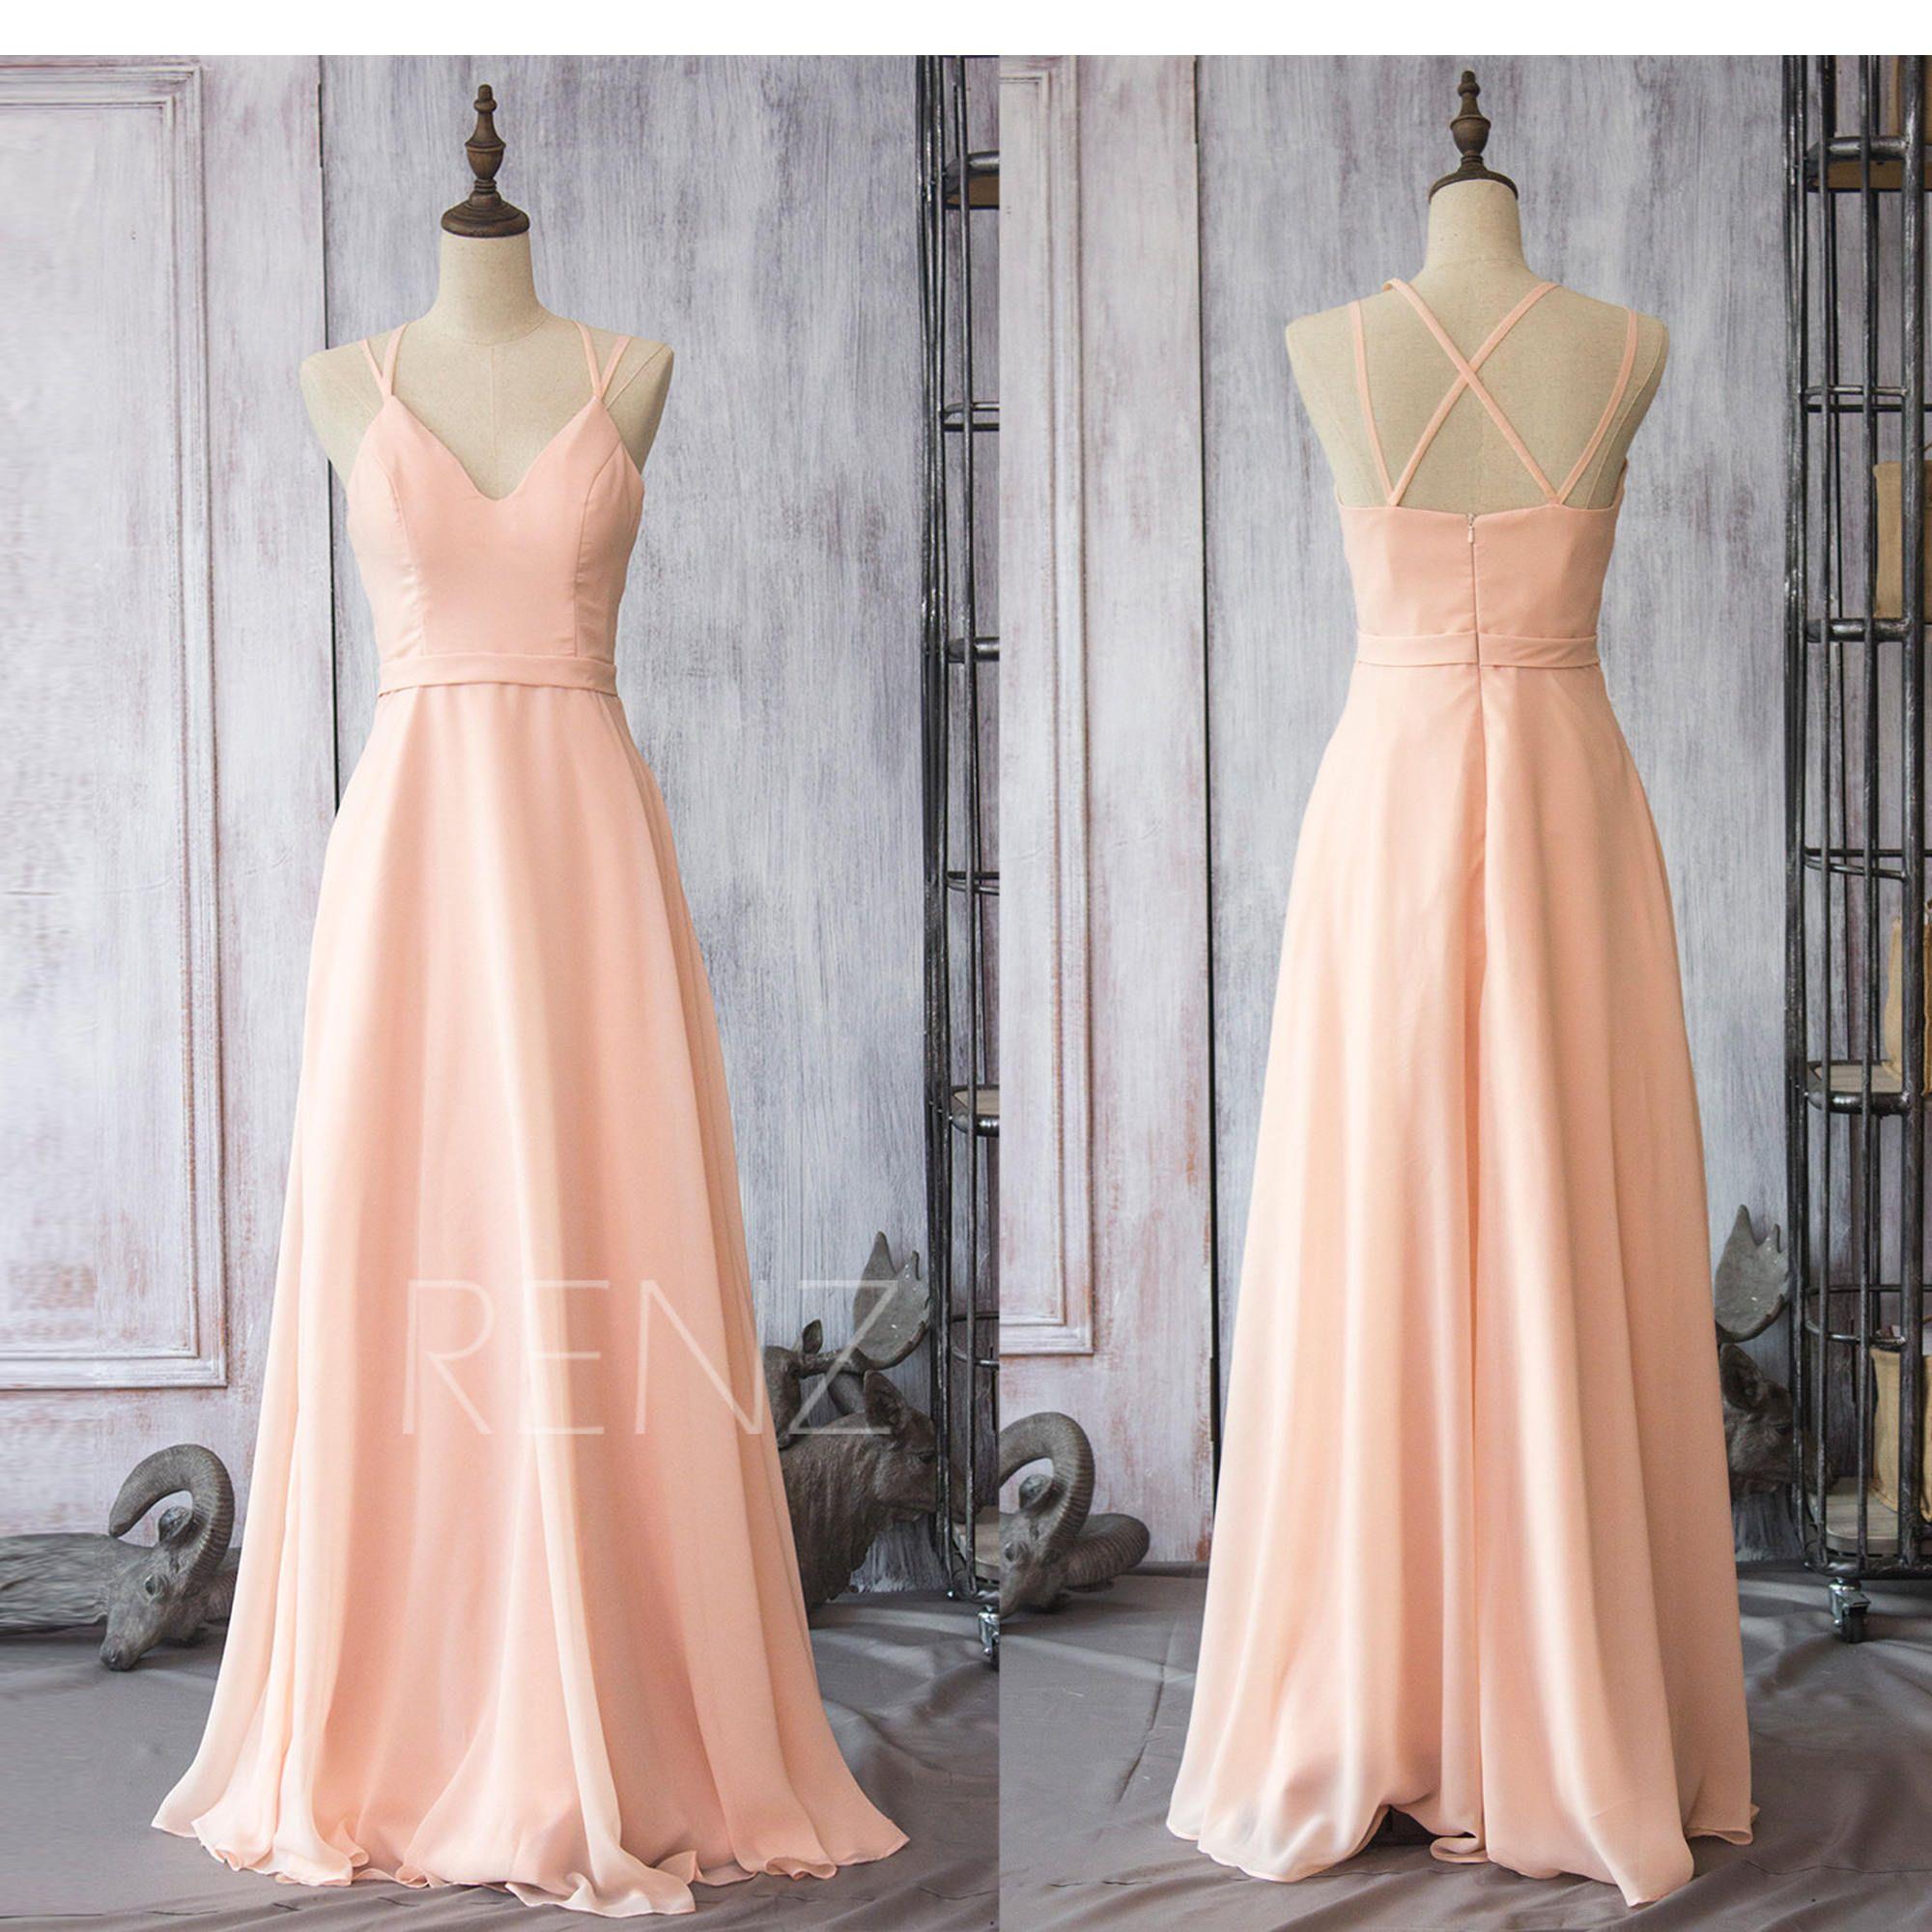 Bridesmaid Dress Peach Chiffon Dress Wedding Dress Criss Cross